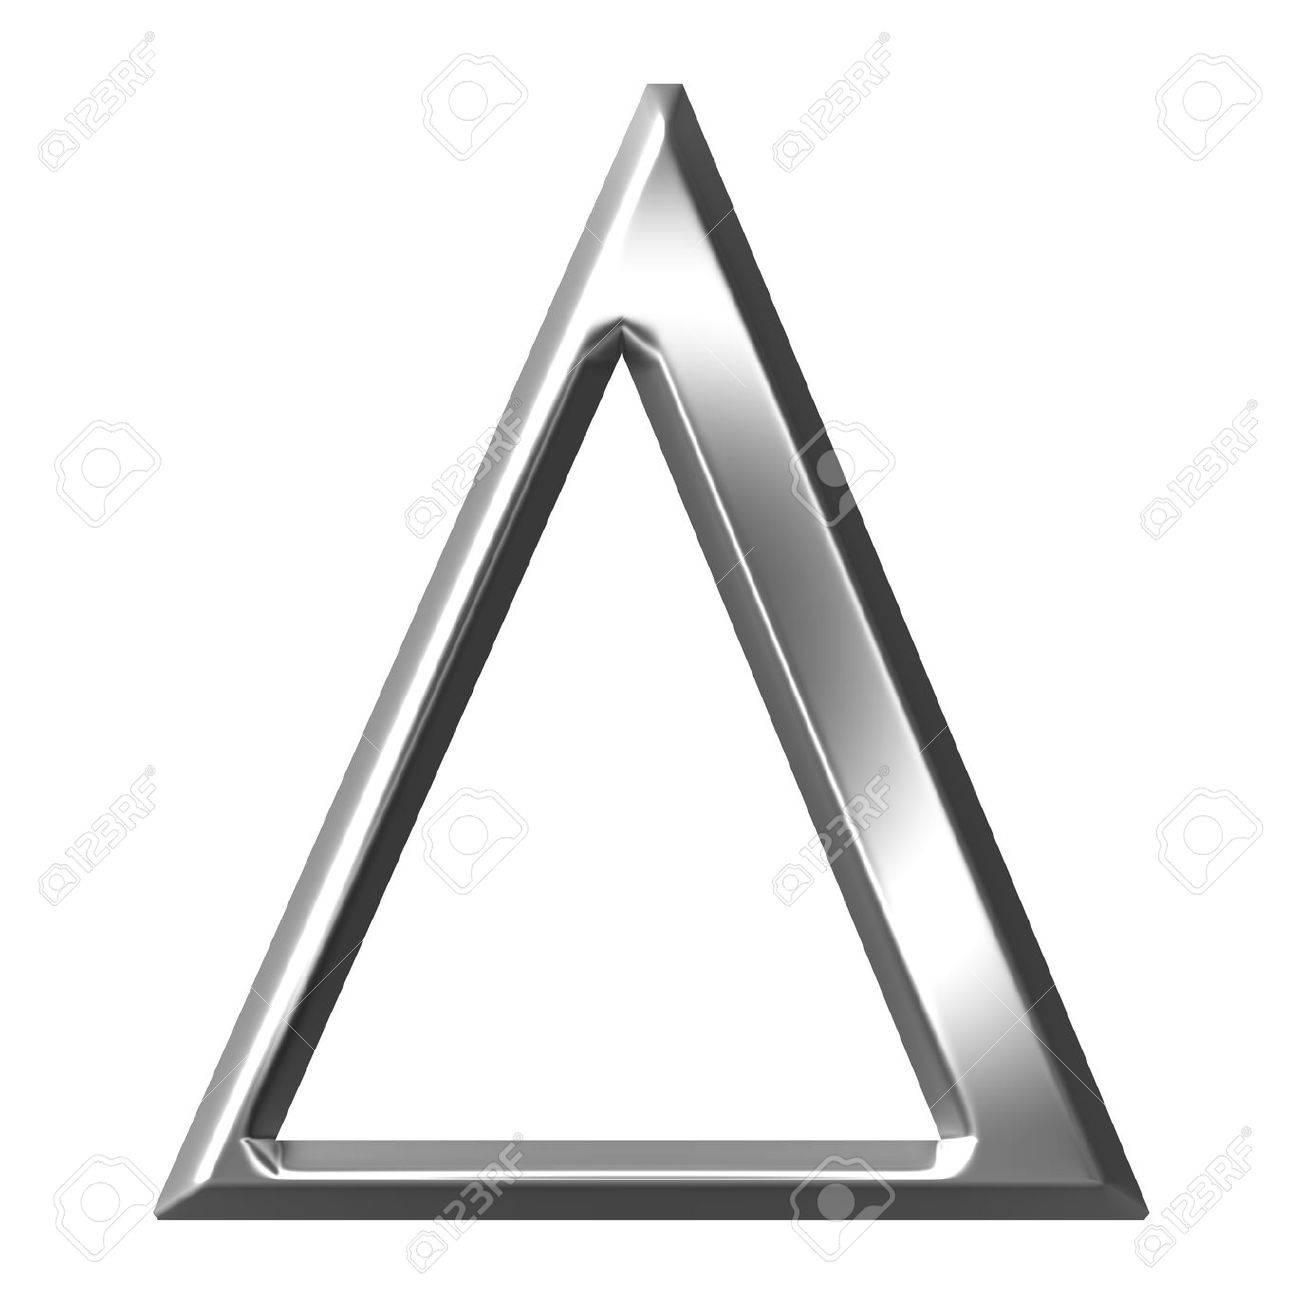 Delta symbol font images symbol and sign ideas 3d silver greek letter delta stock photo picture and royalty free 3d silver greek letter delta buycottarizona